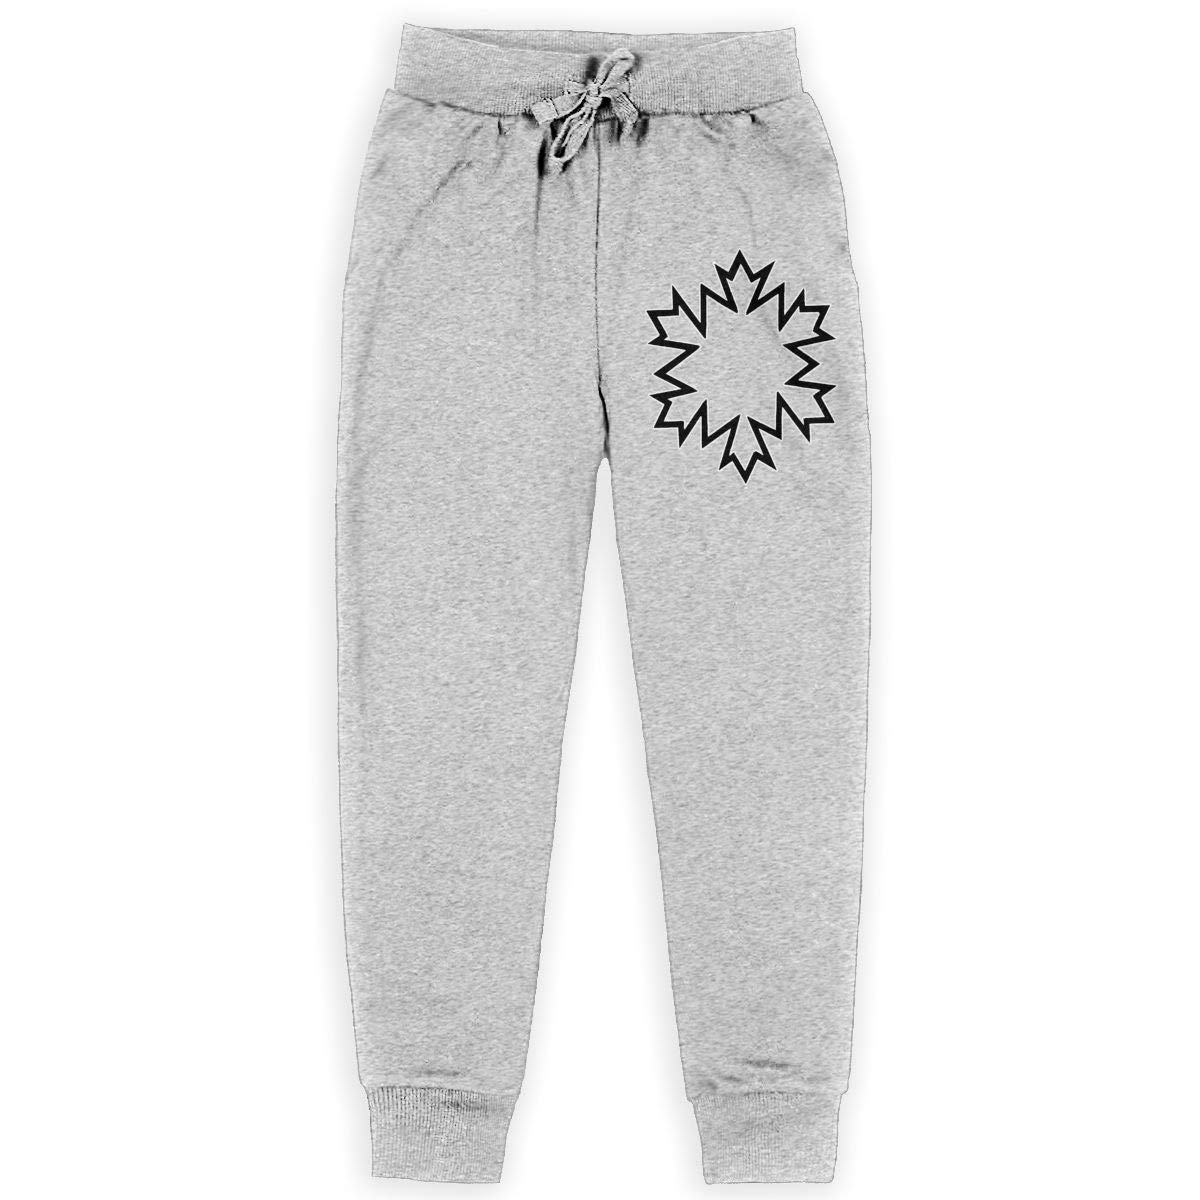 Bing4Bing Star Coloring Teenagers Cotton Sweatpants Joggers Pants Active Pants